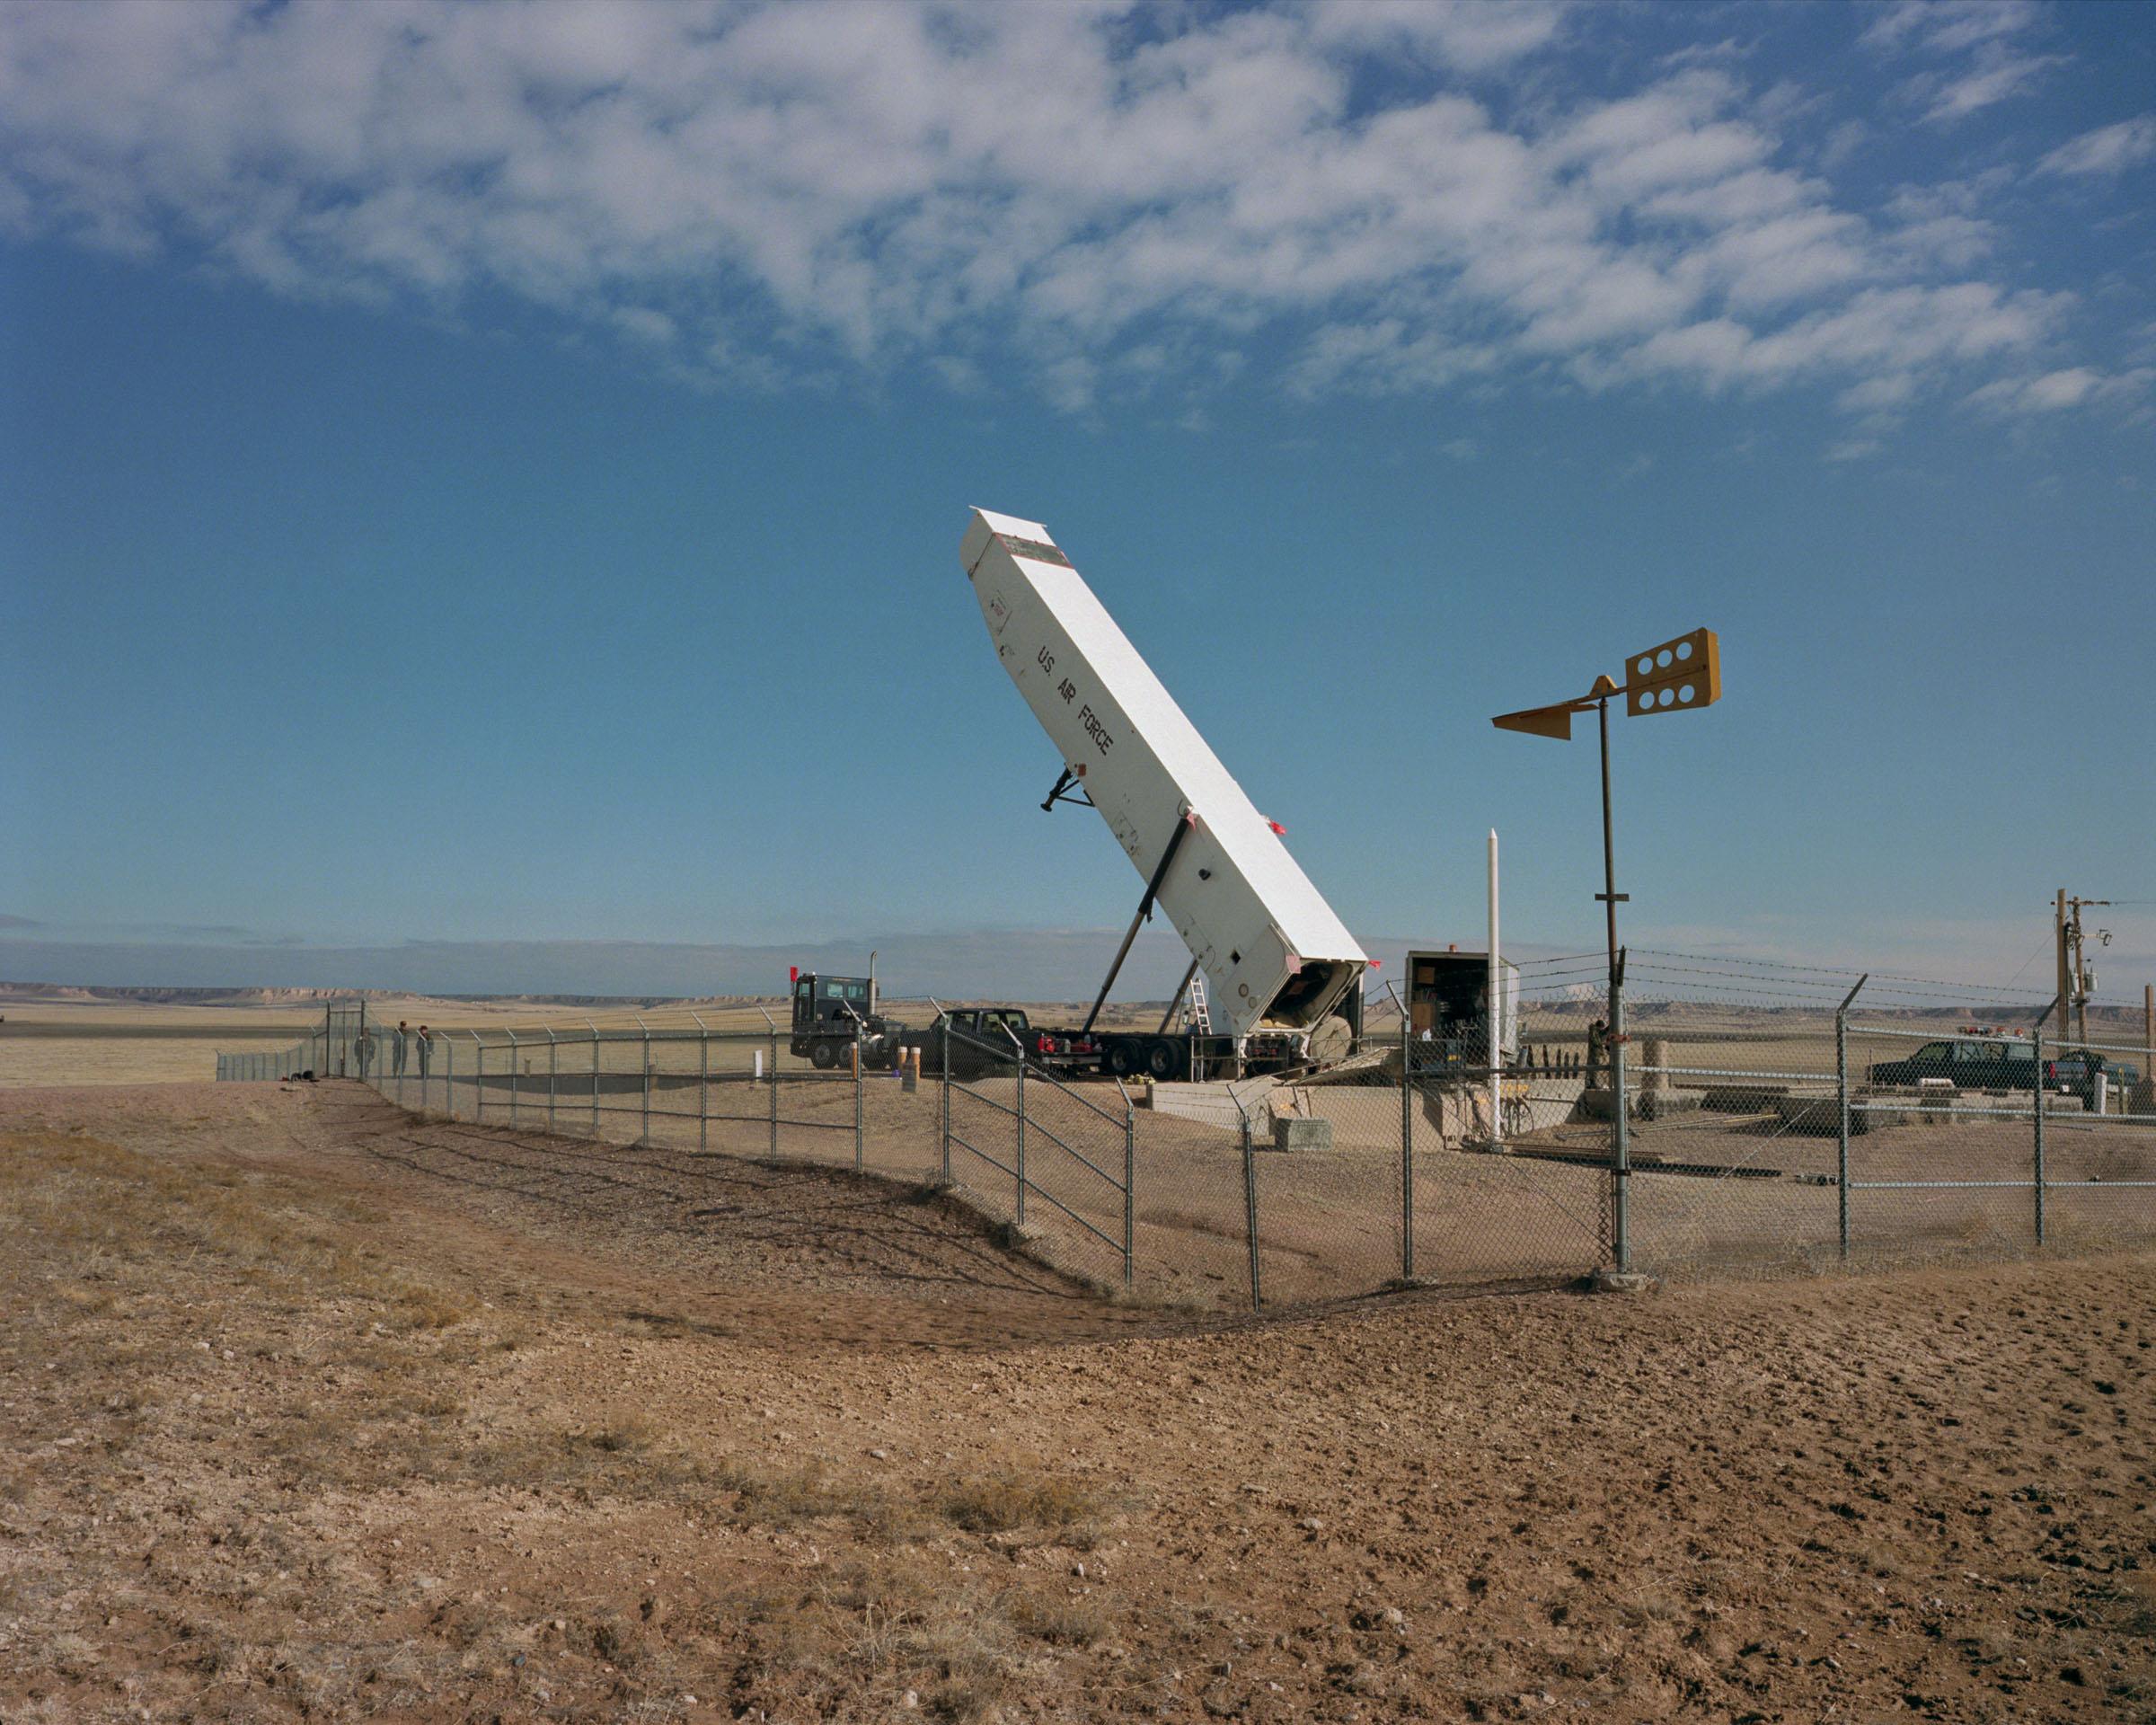 Minuteman III missile, silo J-6, Peetz CO, 1998.